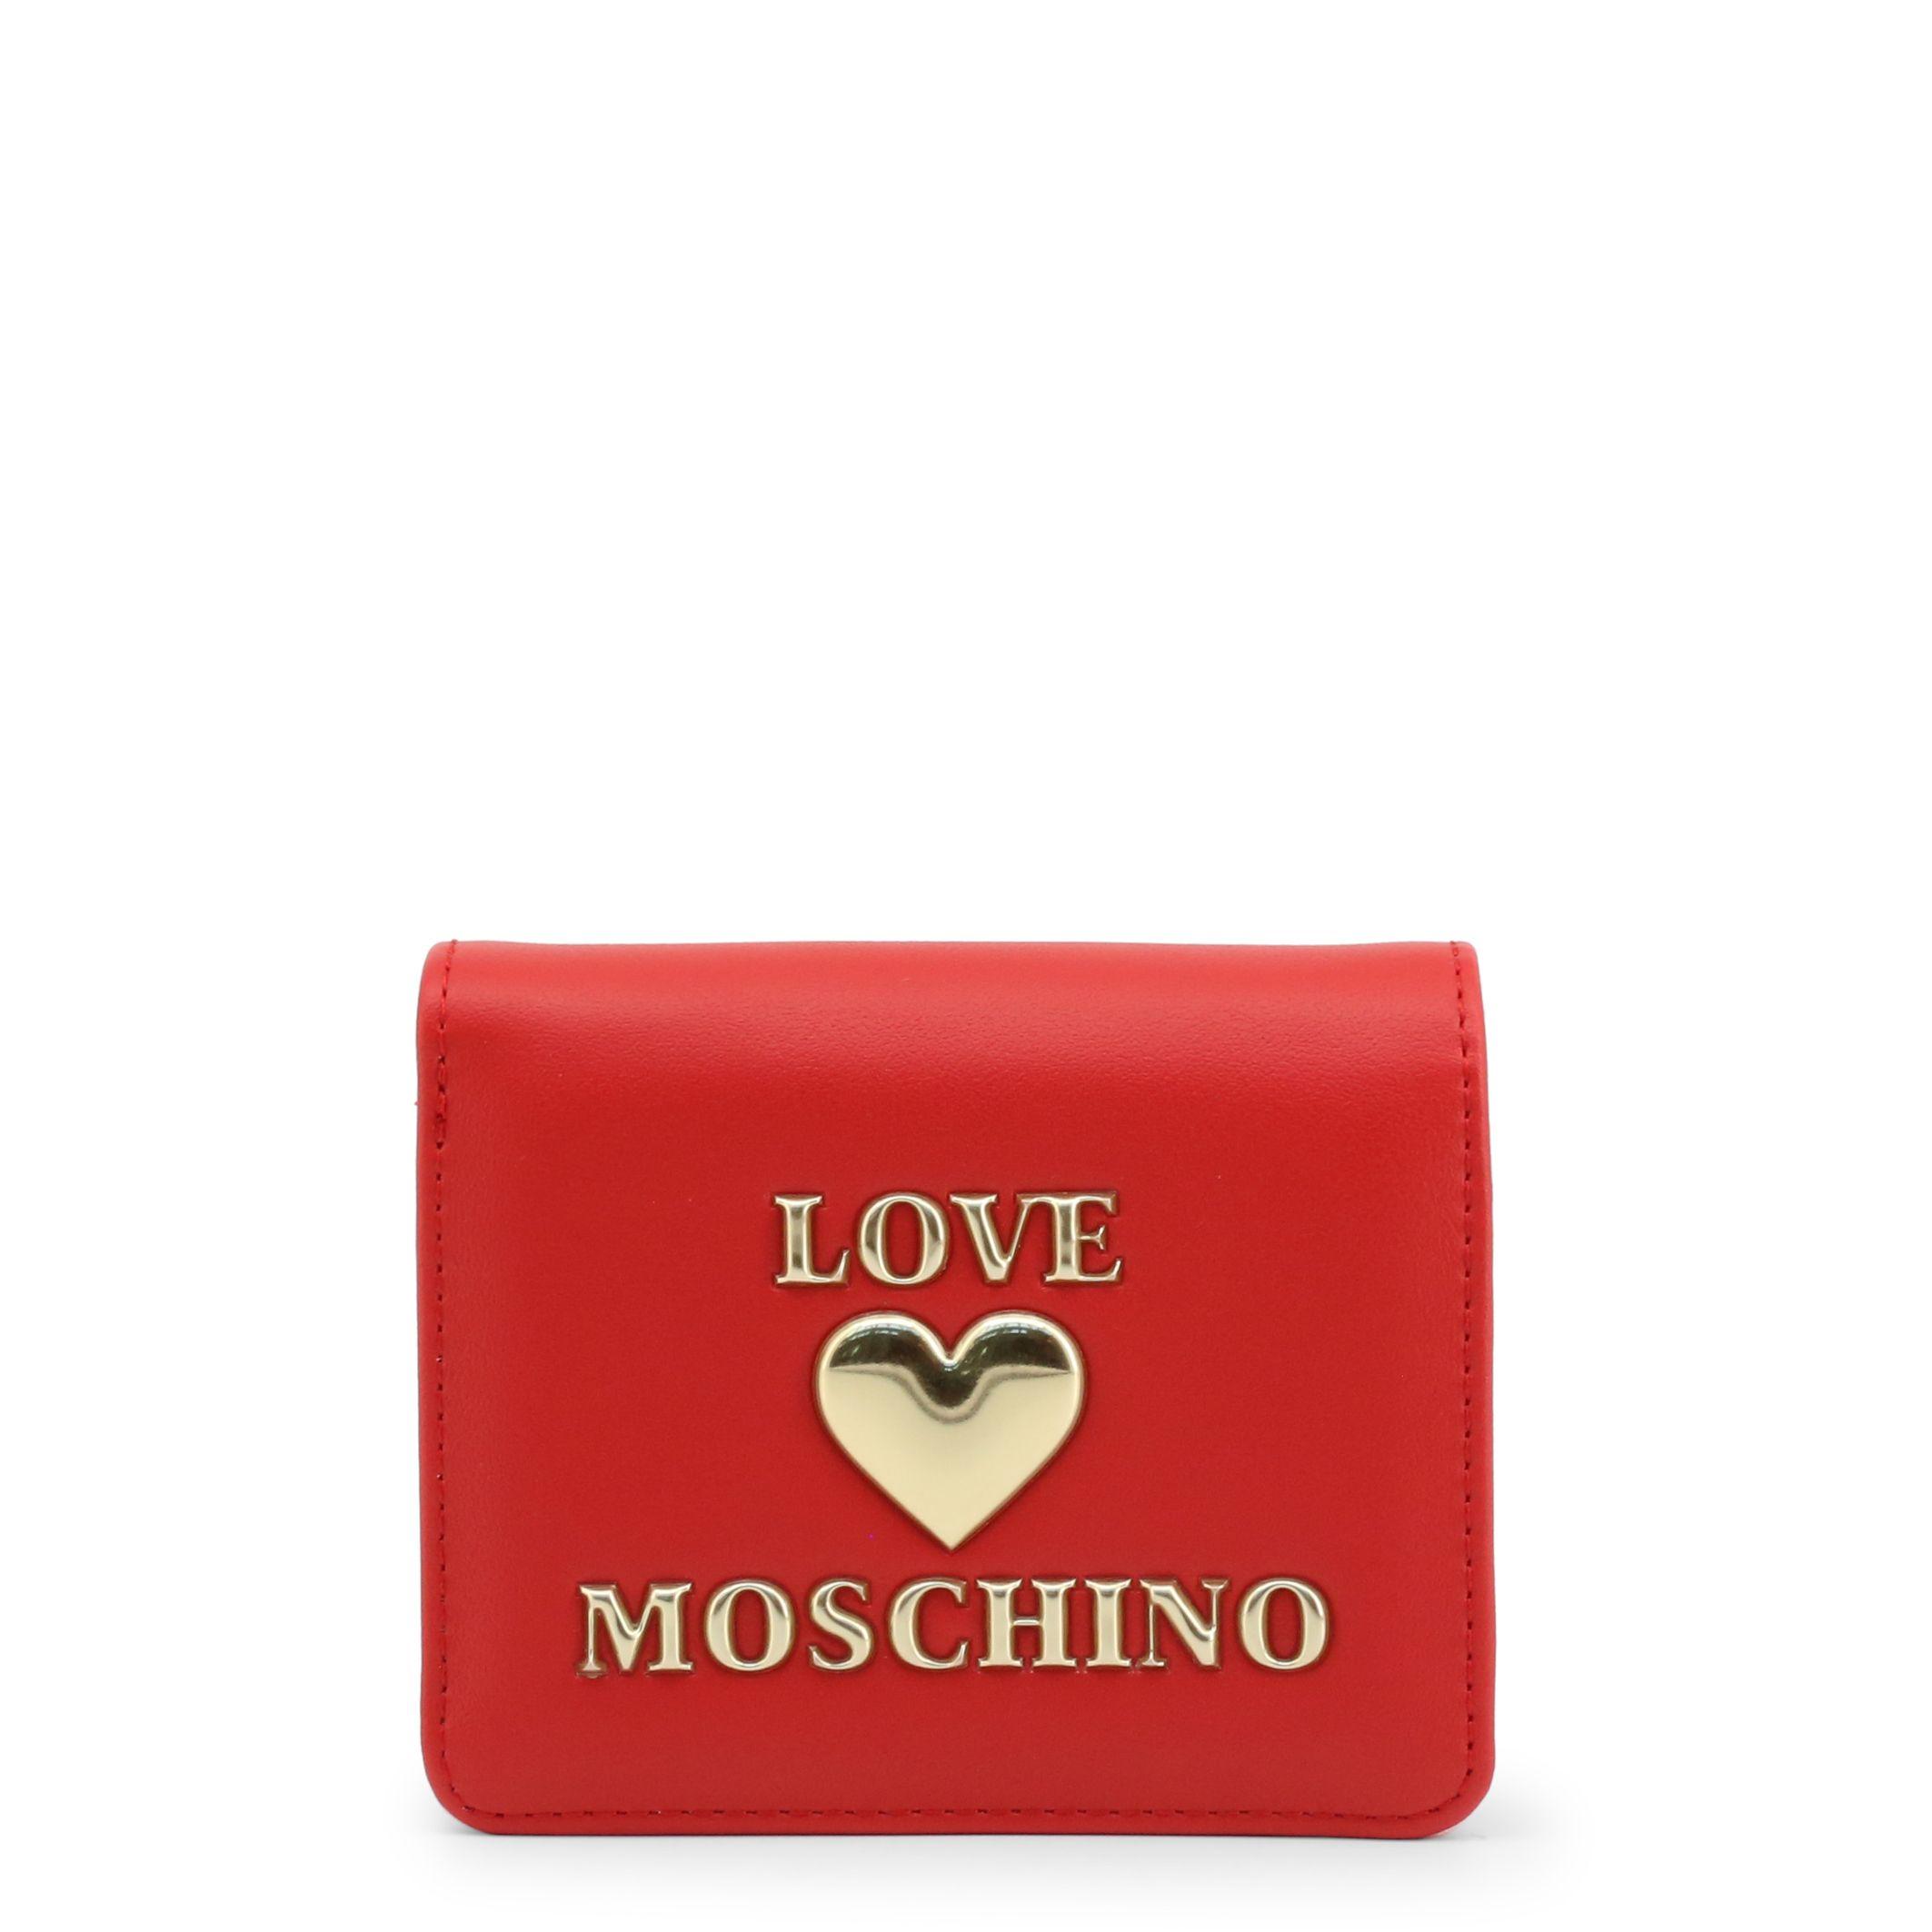 Love Moschino – JC5625PP1CLF0 – Rood Designeritems.nl